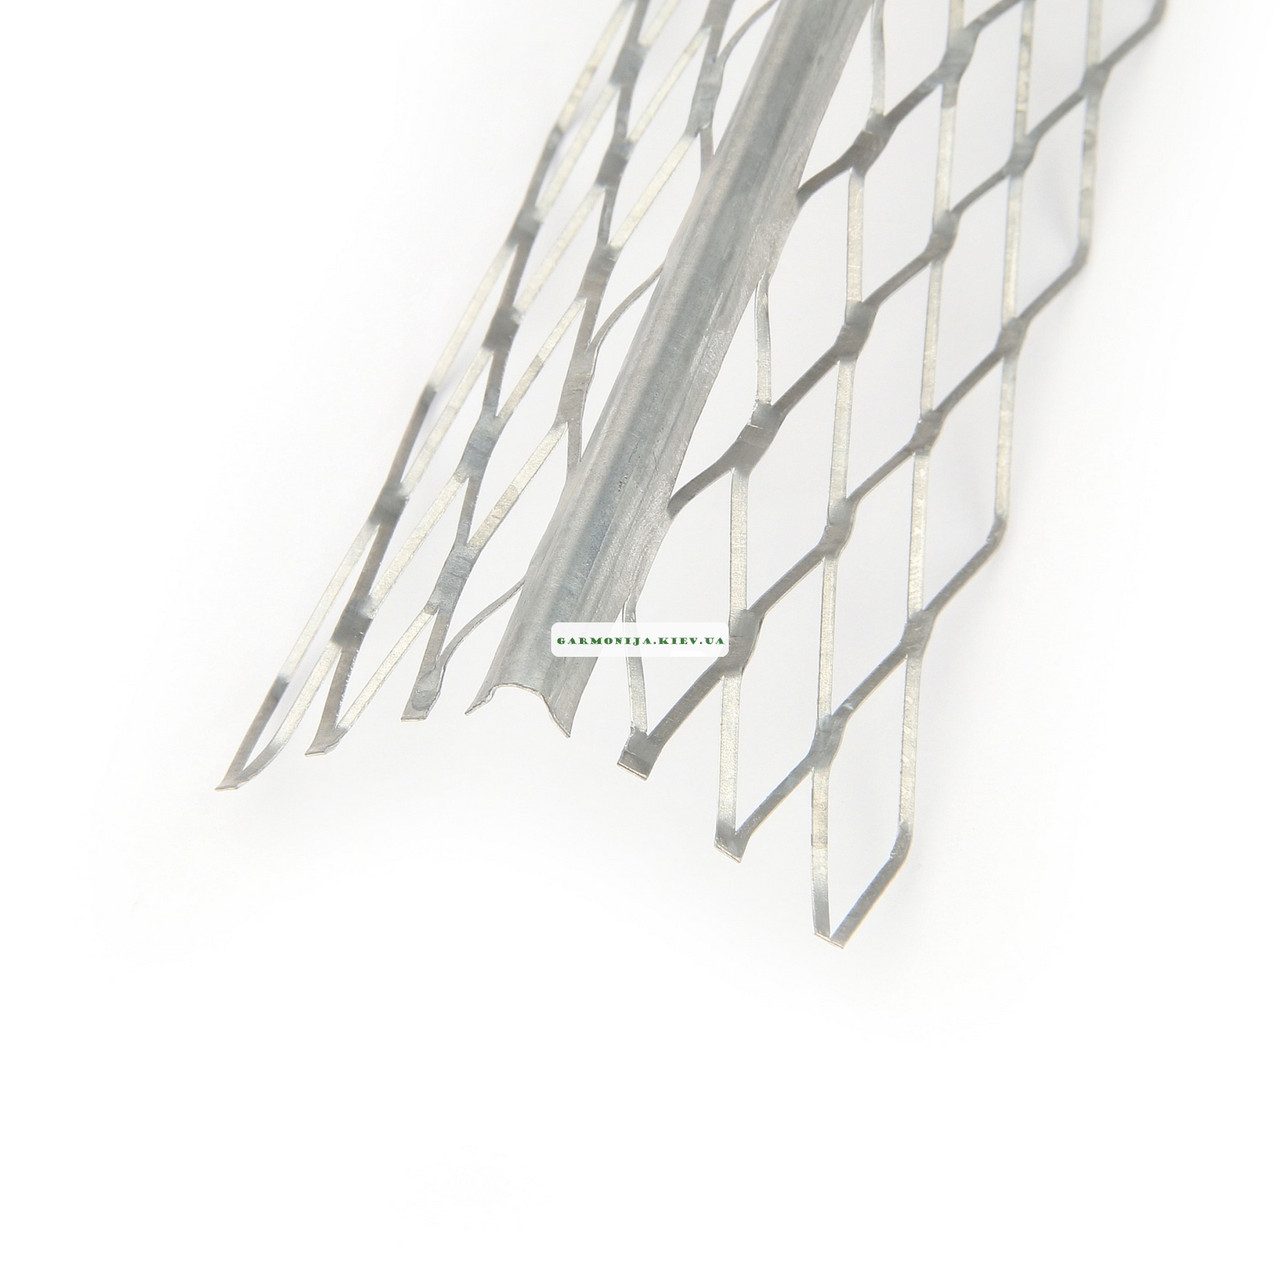 Угол для мокрой штукатурки оцинкованный, 3.0 м 0,35мм